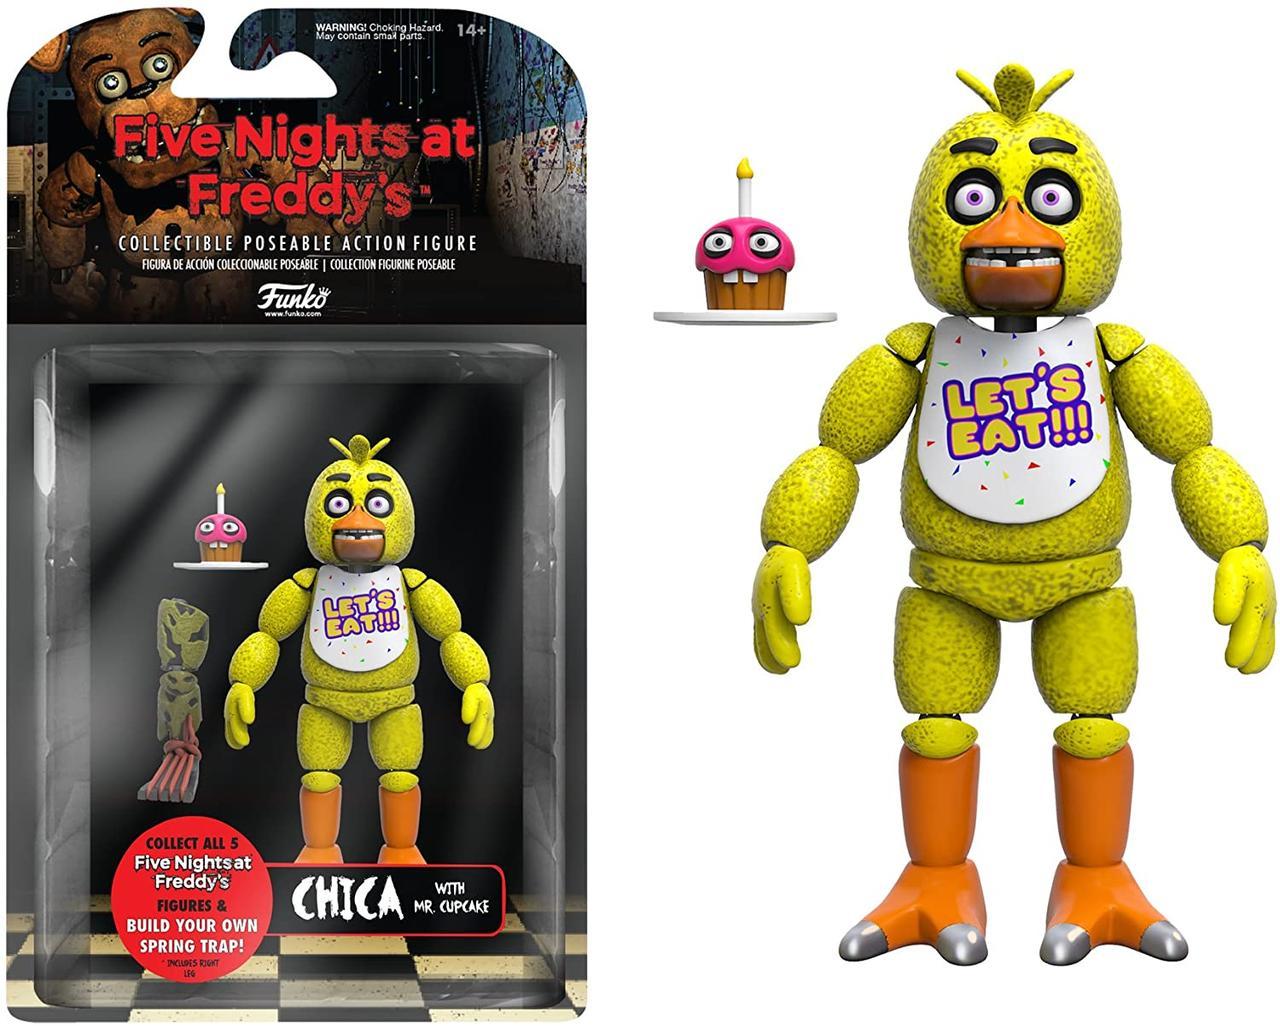 Фигурка Чико Funko Five Nights at Freddy's Articulated Chica Action Figure